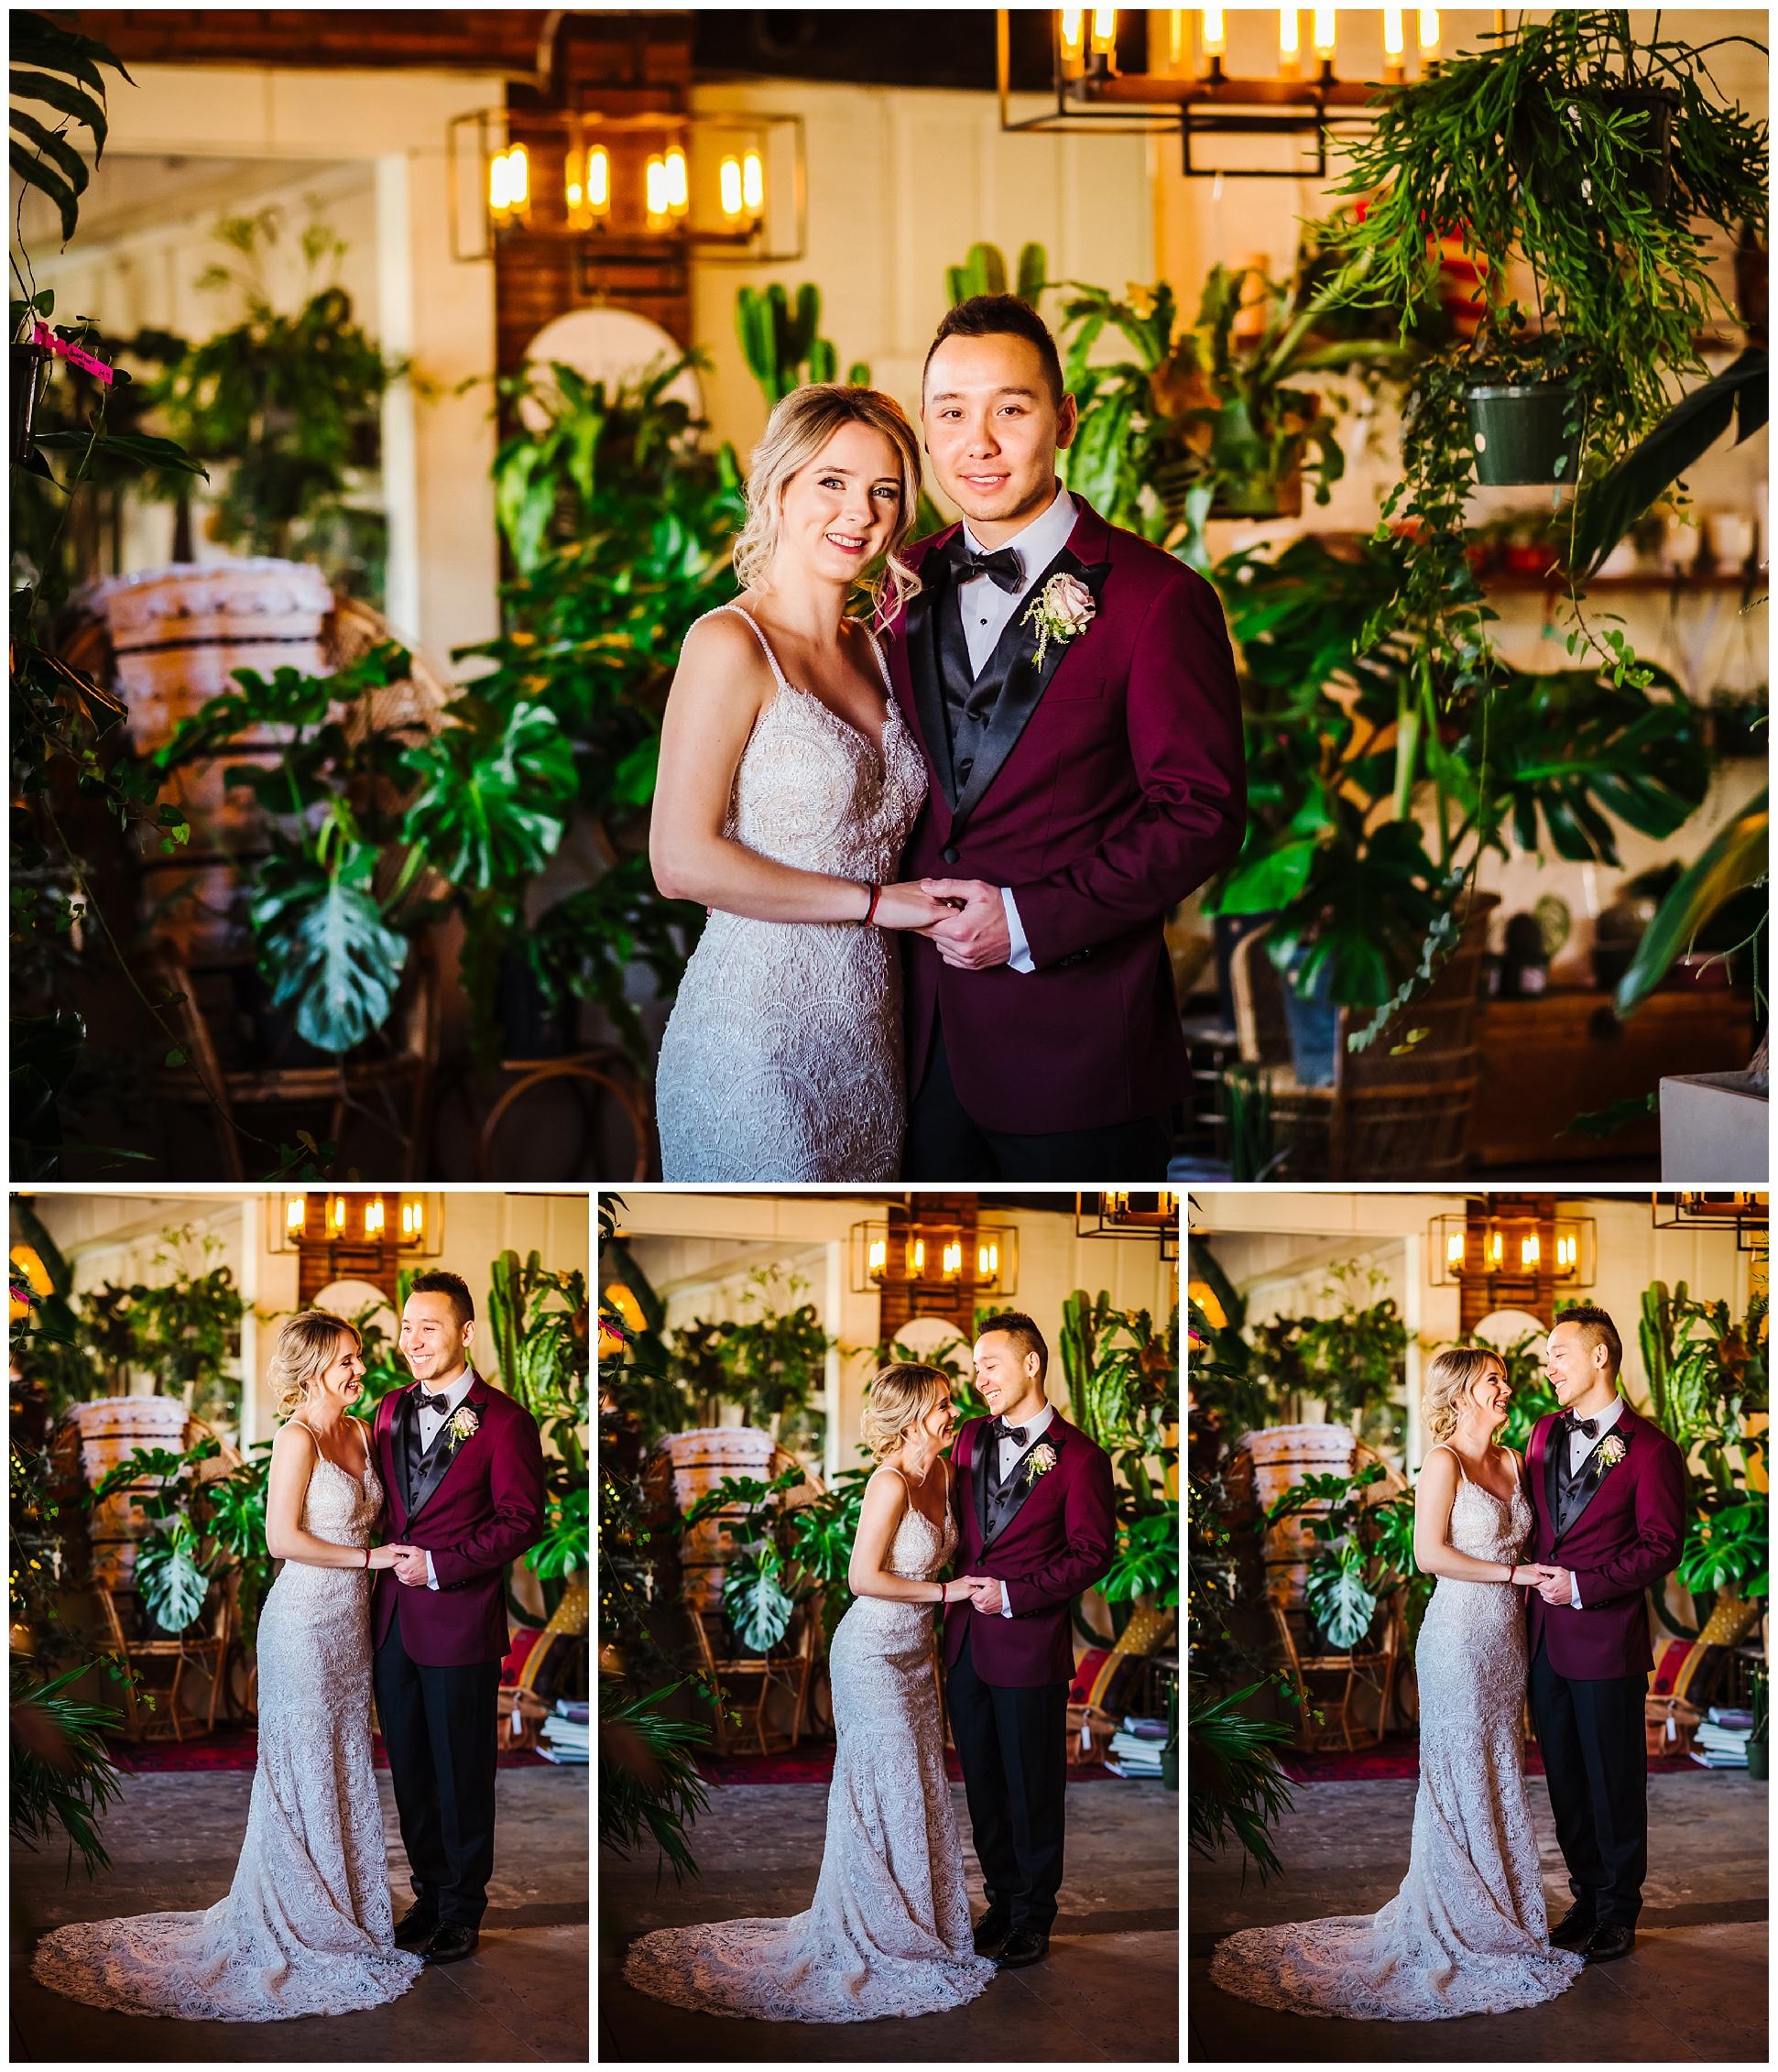 tampa-armeture-wedding-photographer-edgy-industrial-downtown-fancy-free-nursery-tattoo-burgandy-velvet_0025.jpg